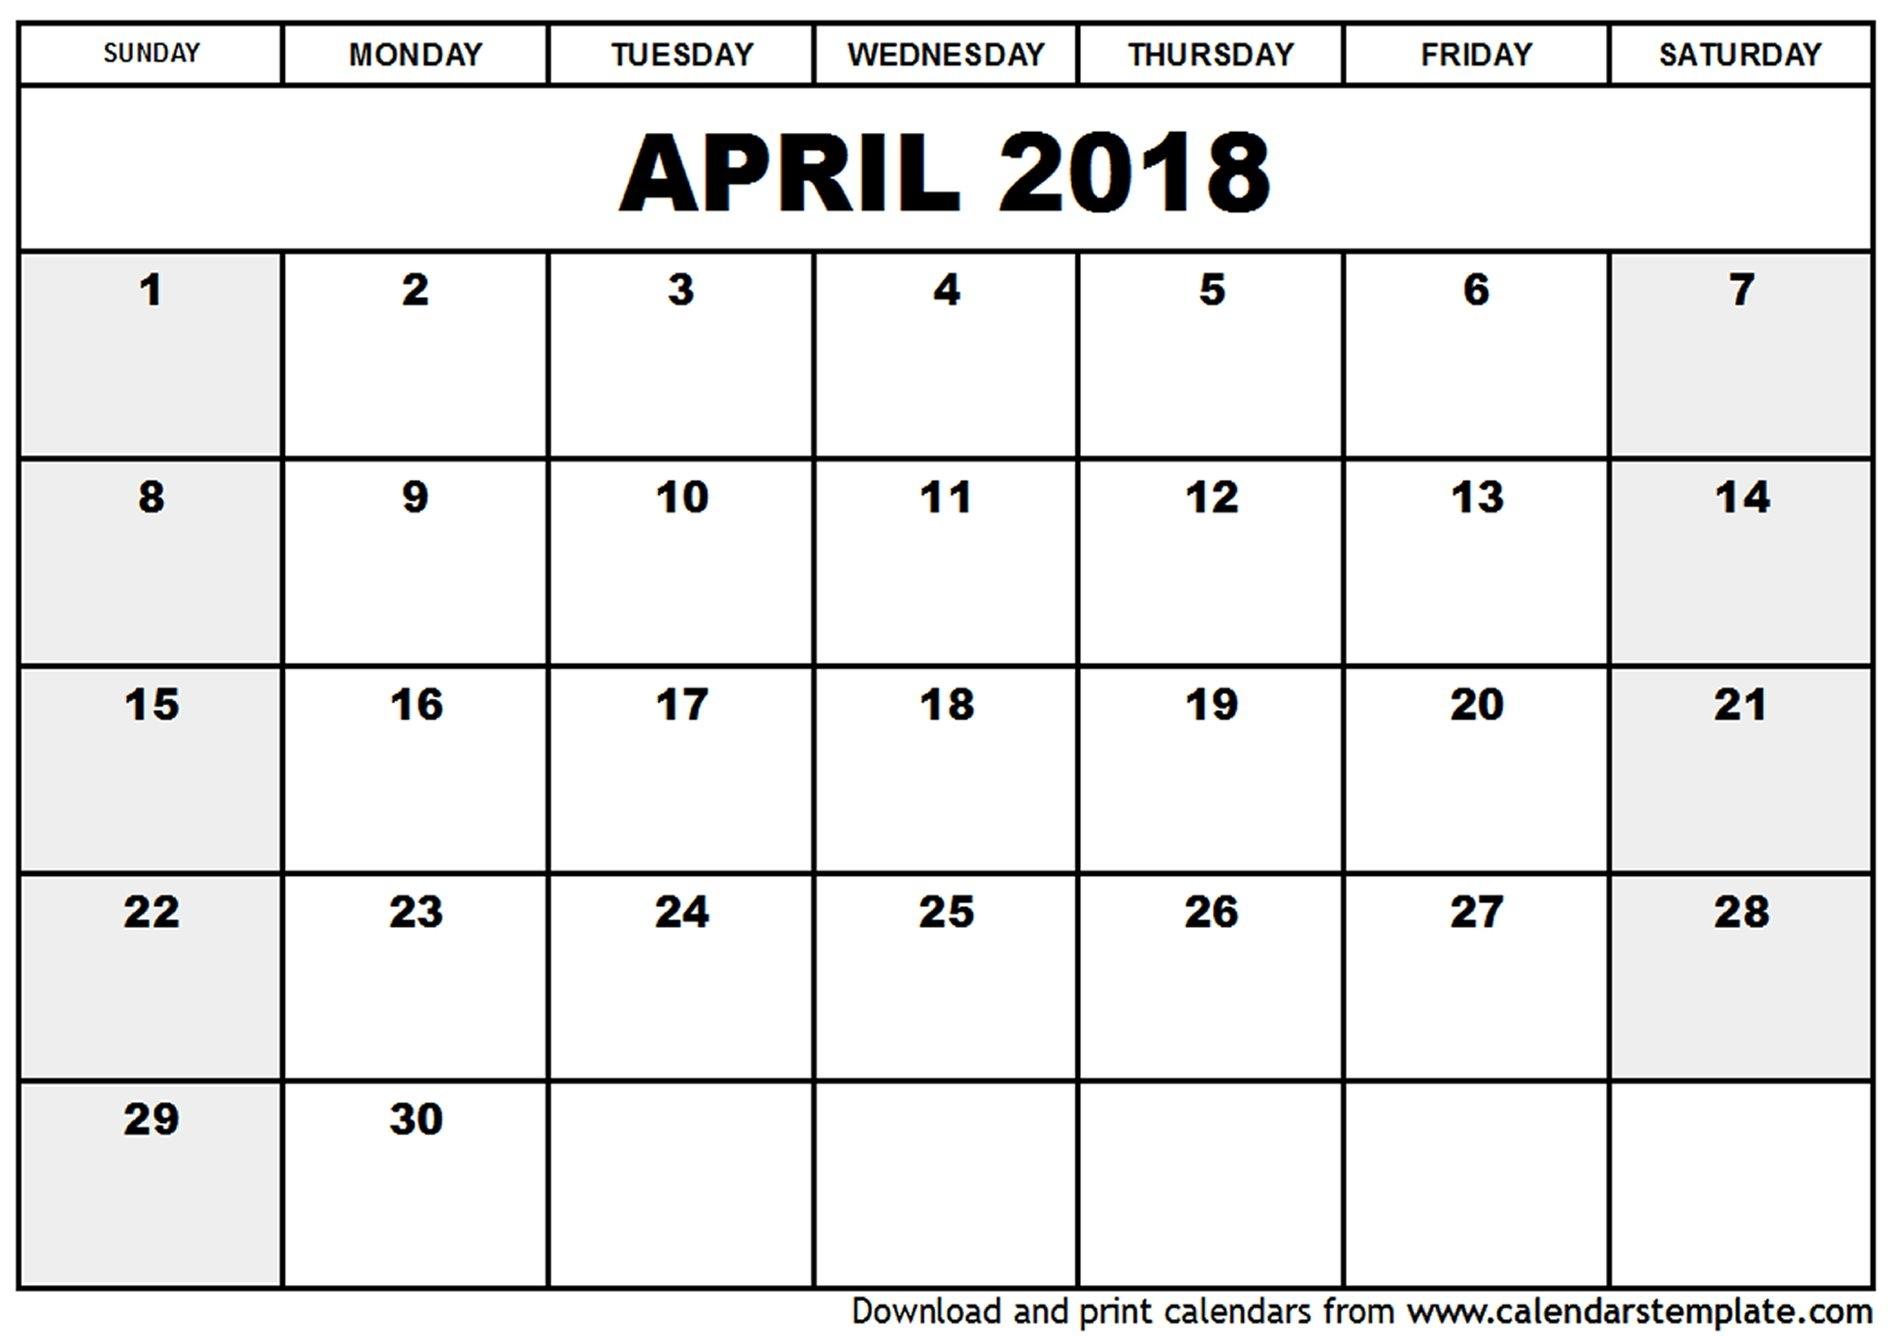 March April 2018 Calendar Printable Yspages